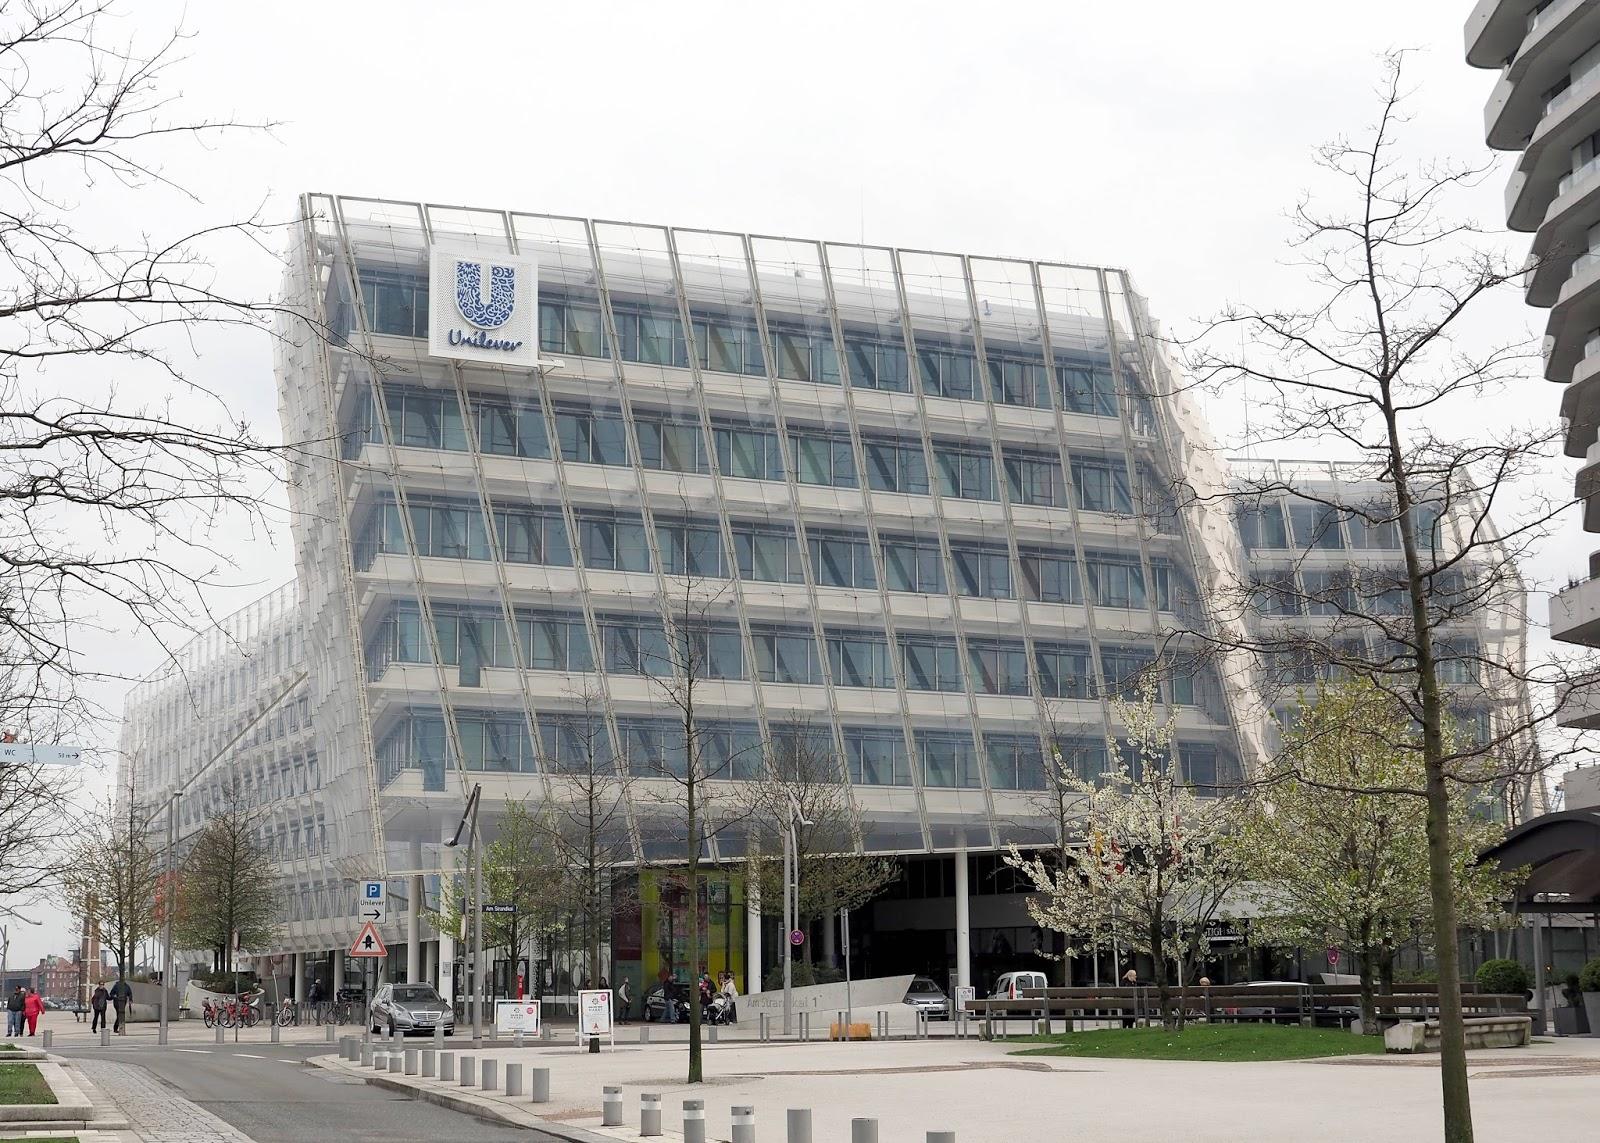 Hamburg 2016 - Unilever Headquarter and Marco Polo Tower